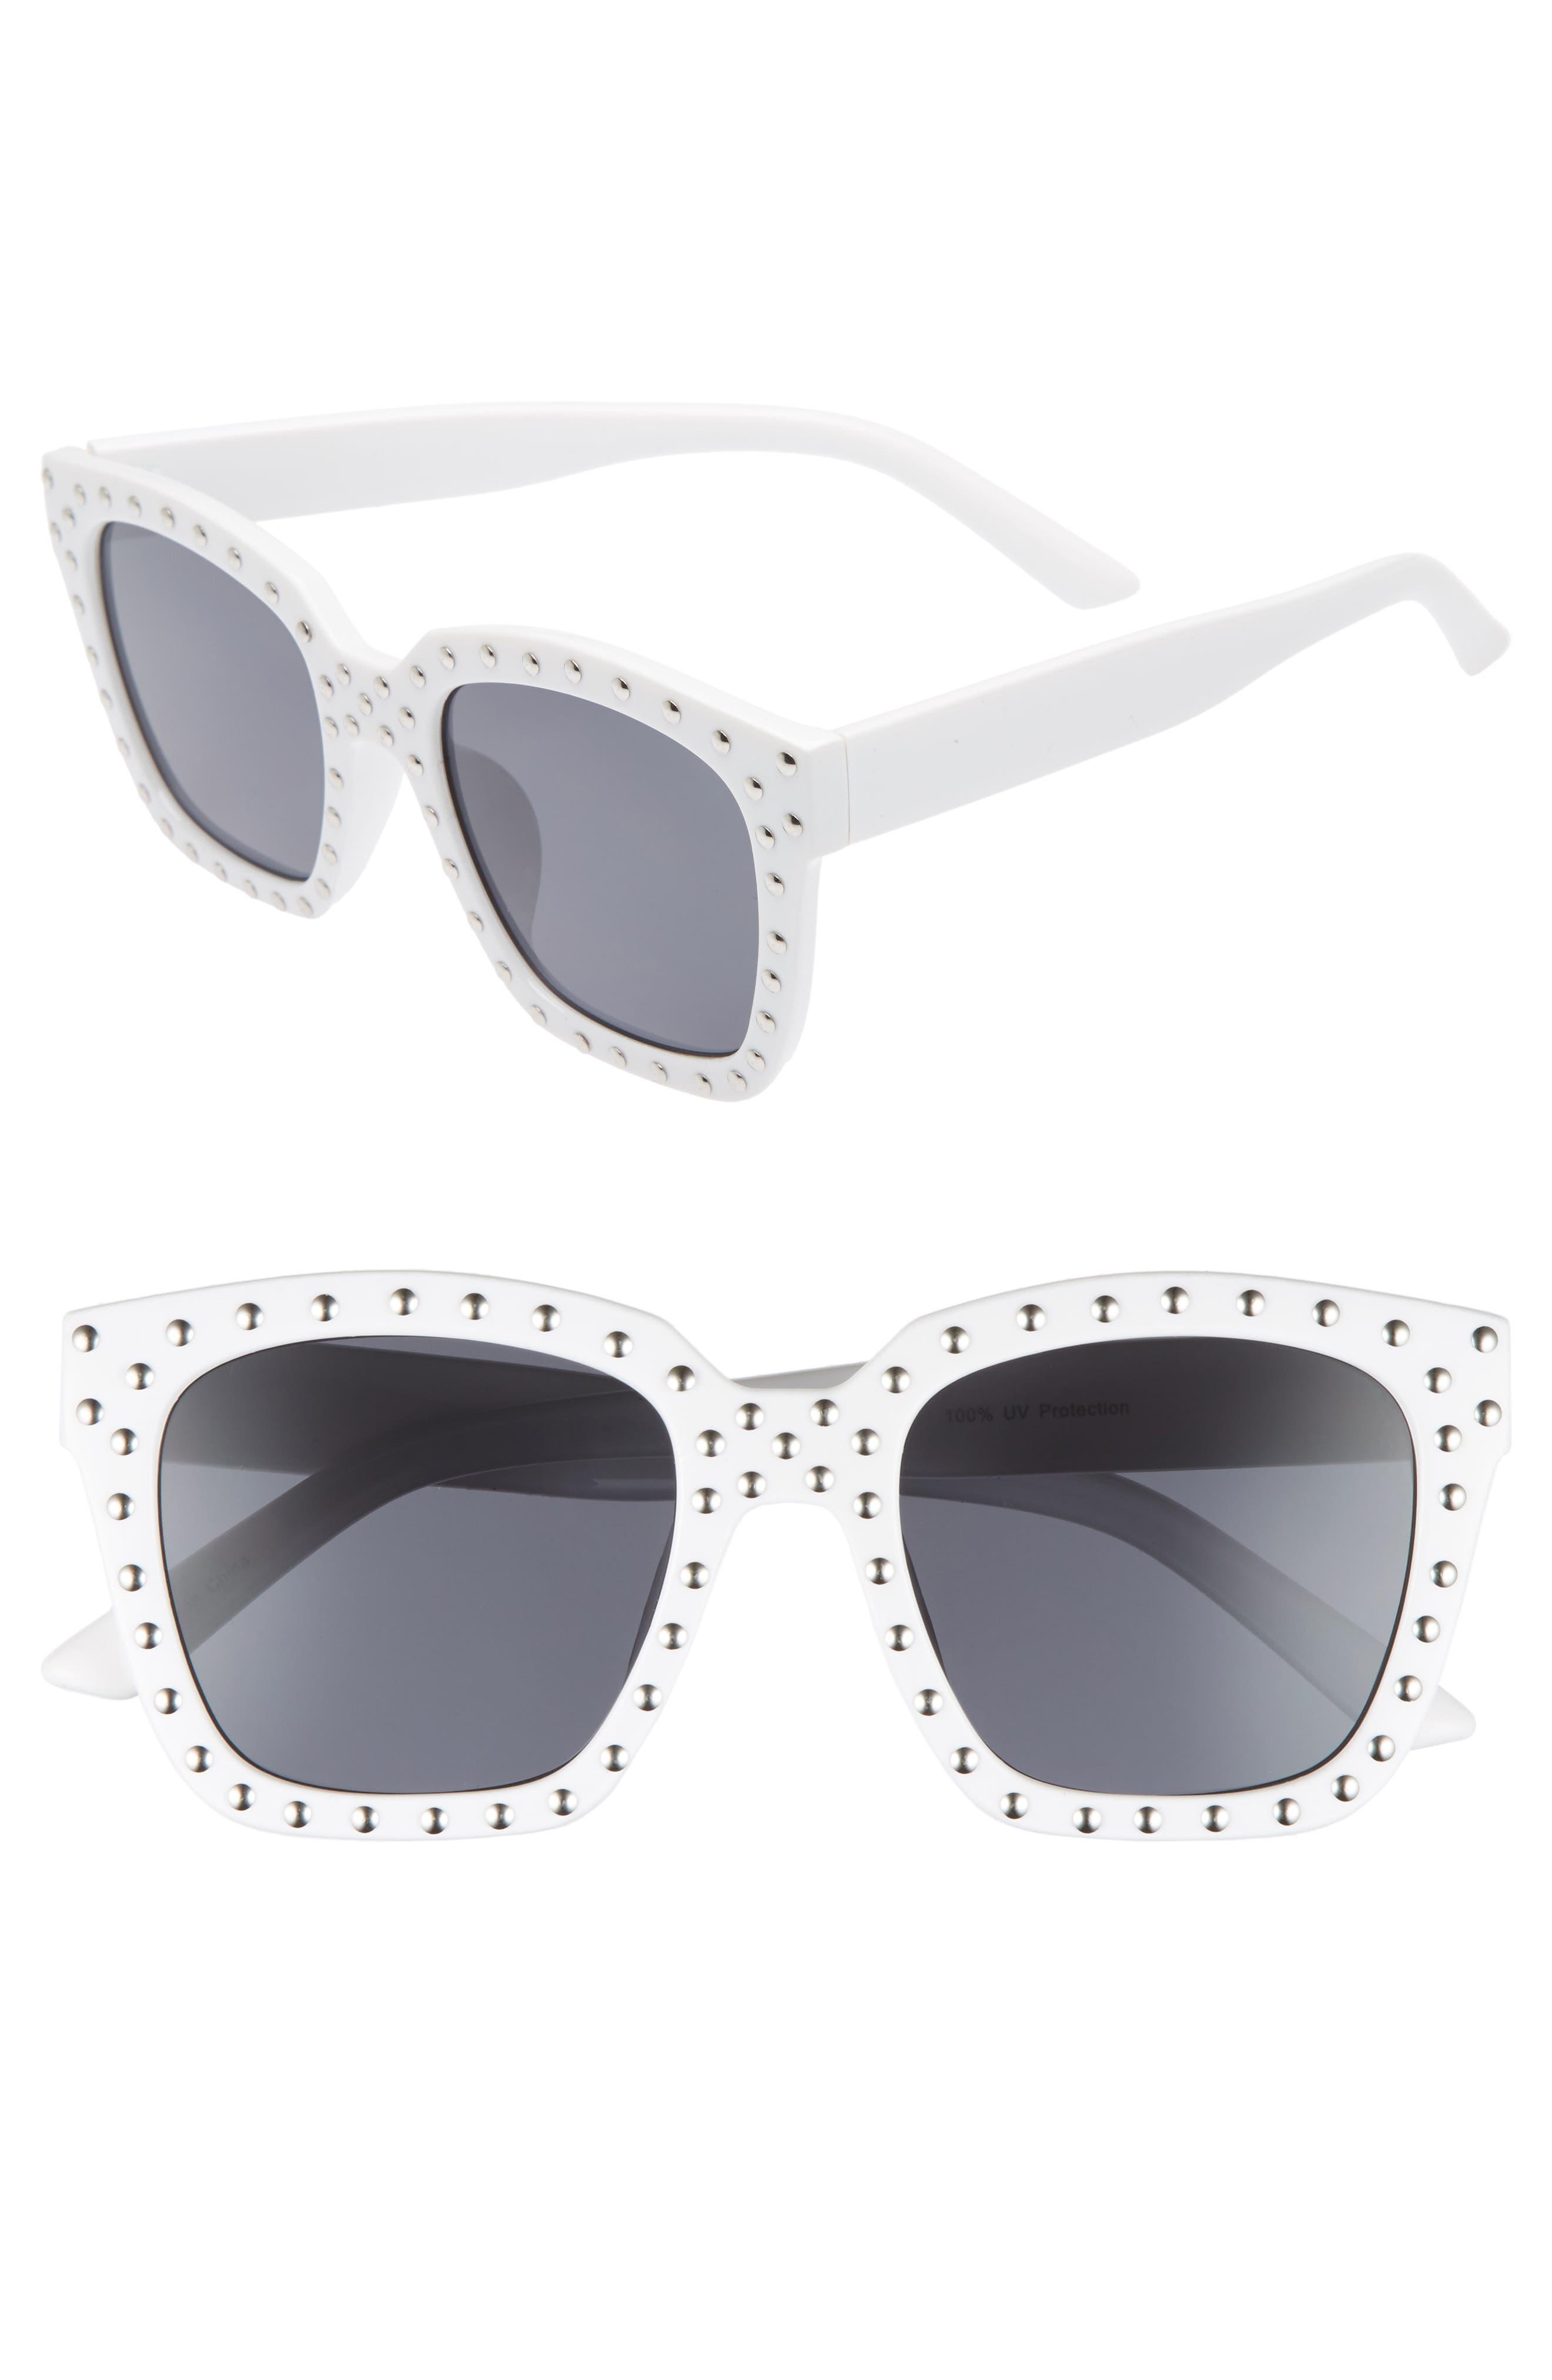 Studded Square Sunglasses,                         Main,                         color, WHITE/ SILVER